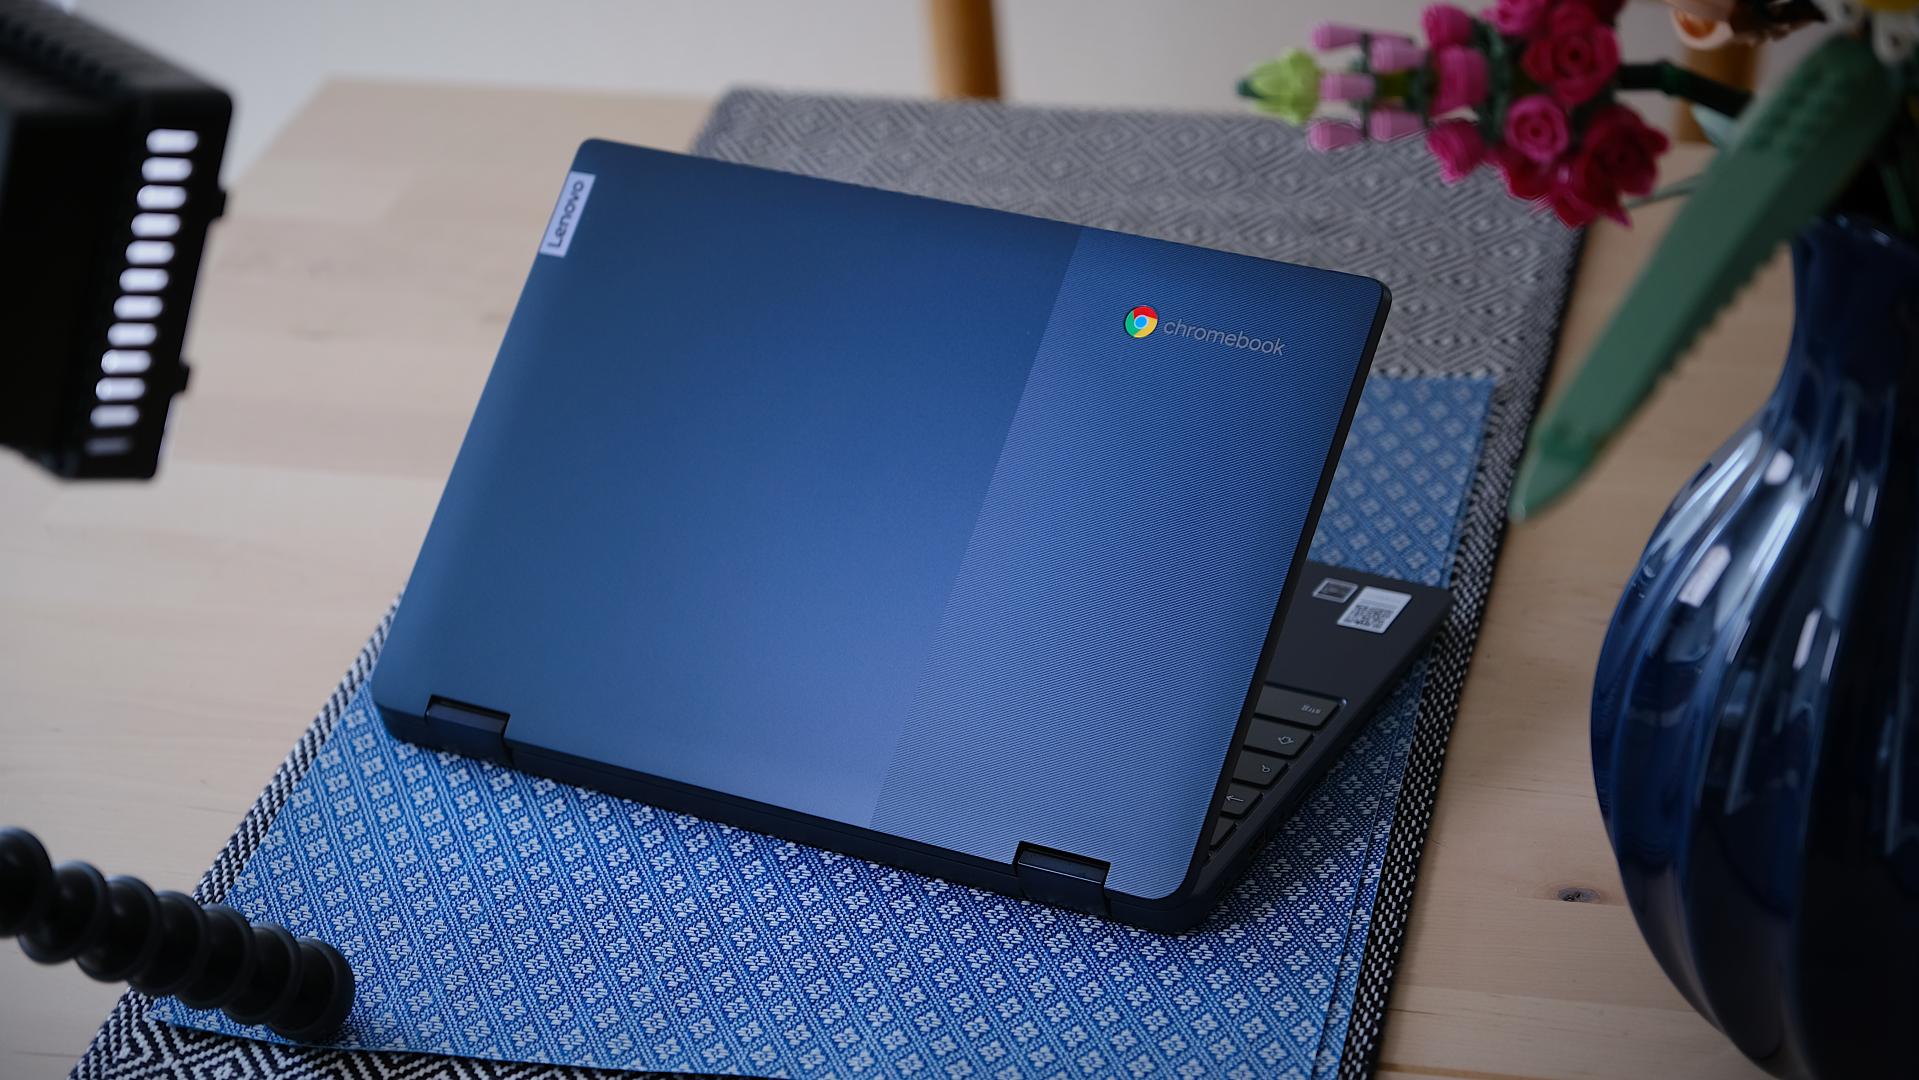 Lenovo IdeaPad Flex 3 Chromebook Review 2021